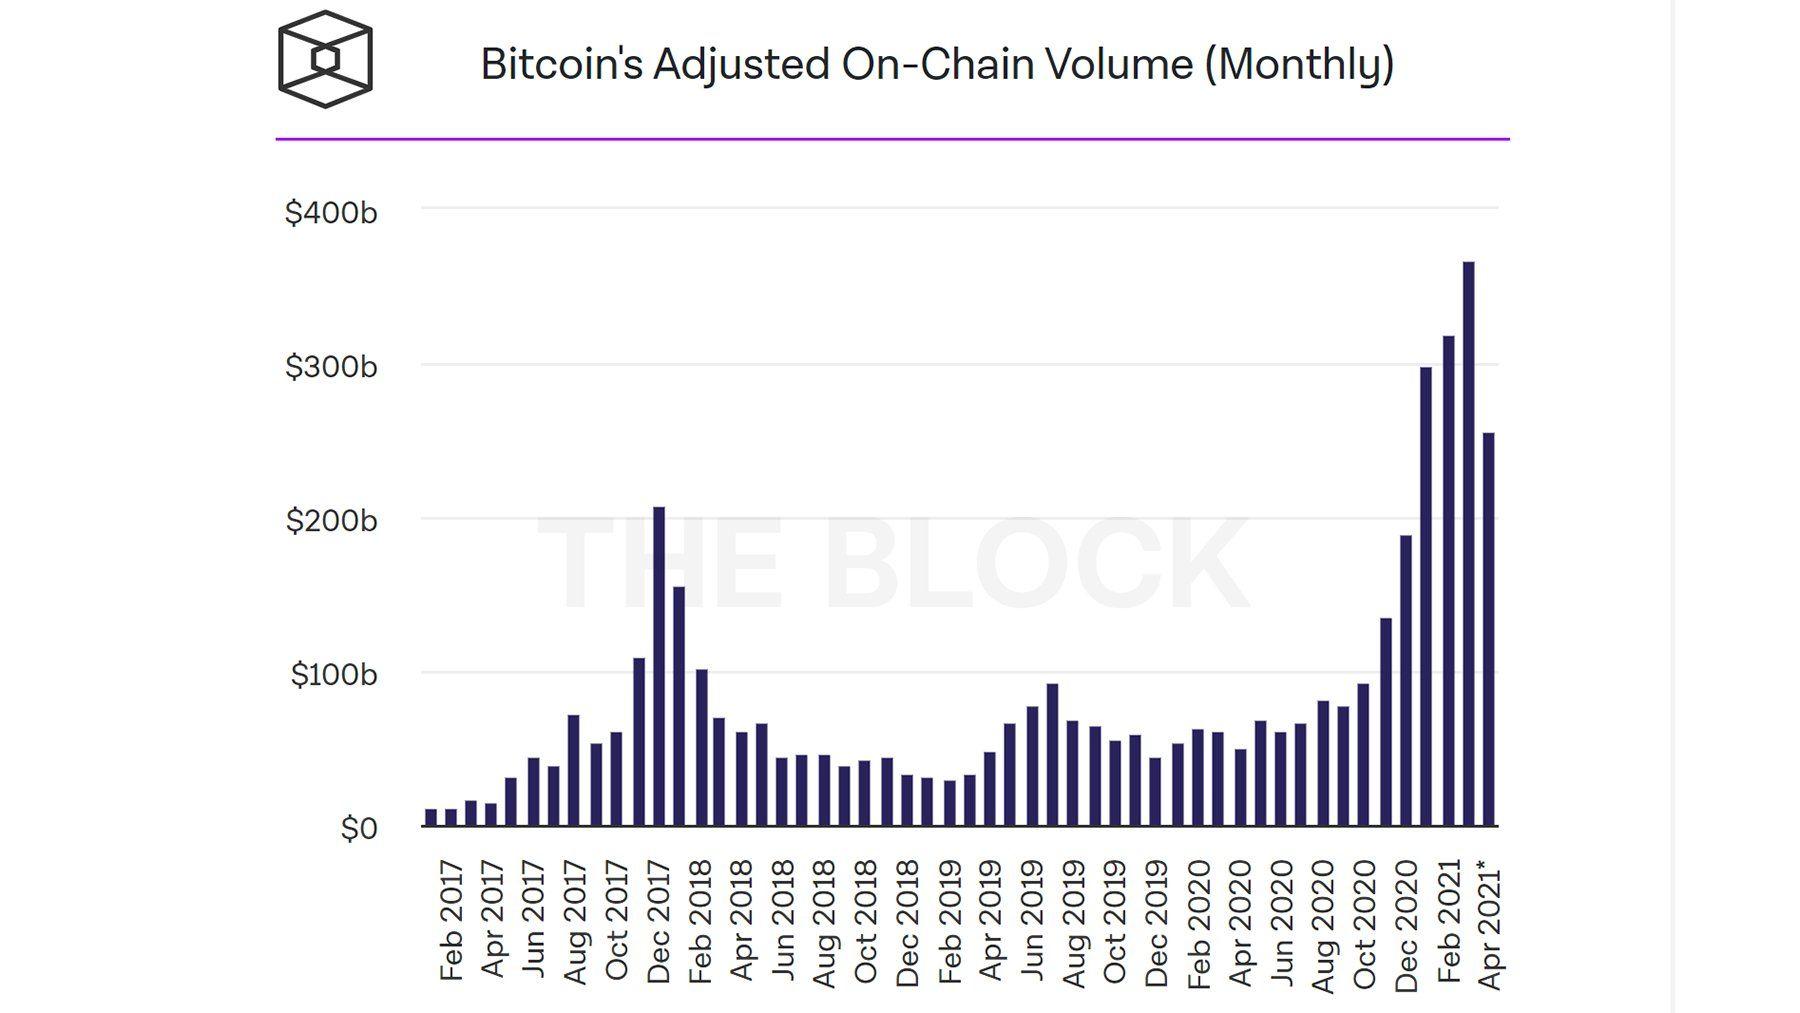 On-chain volume